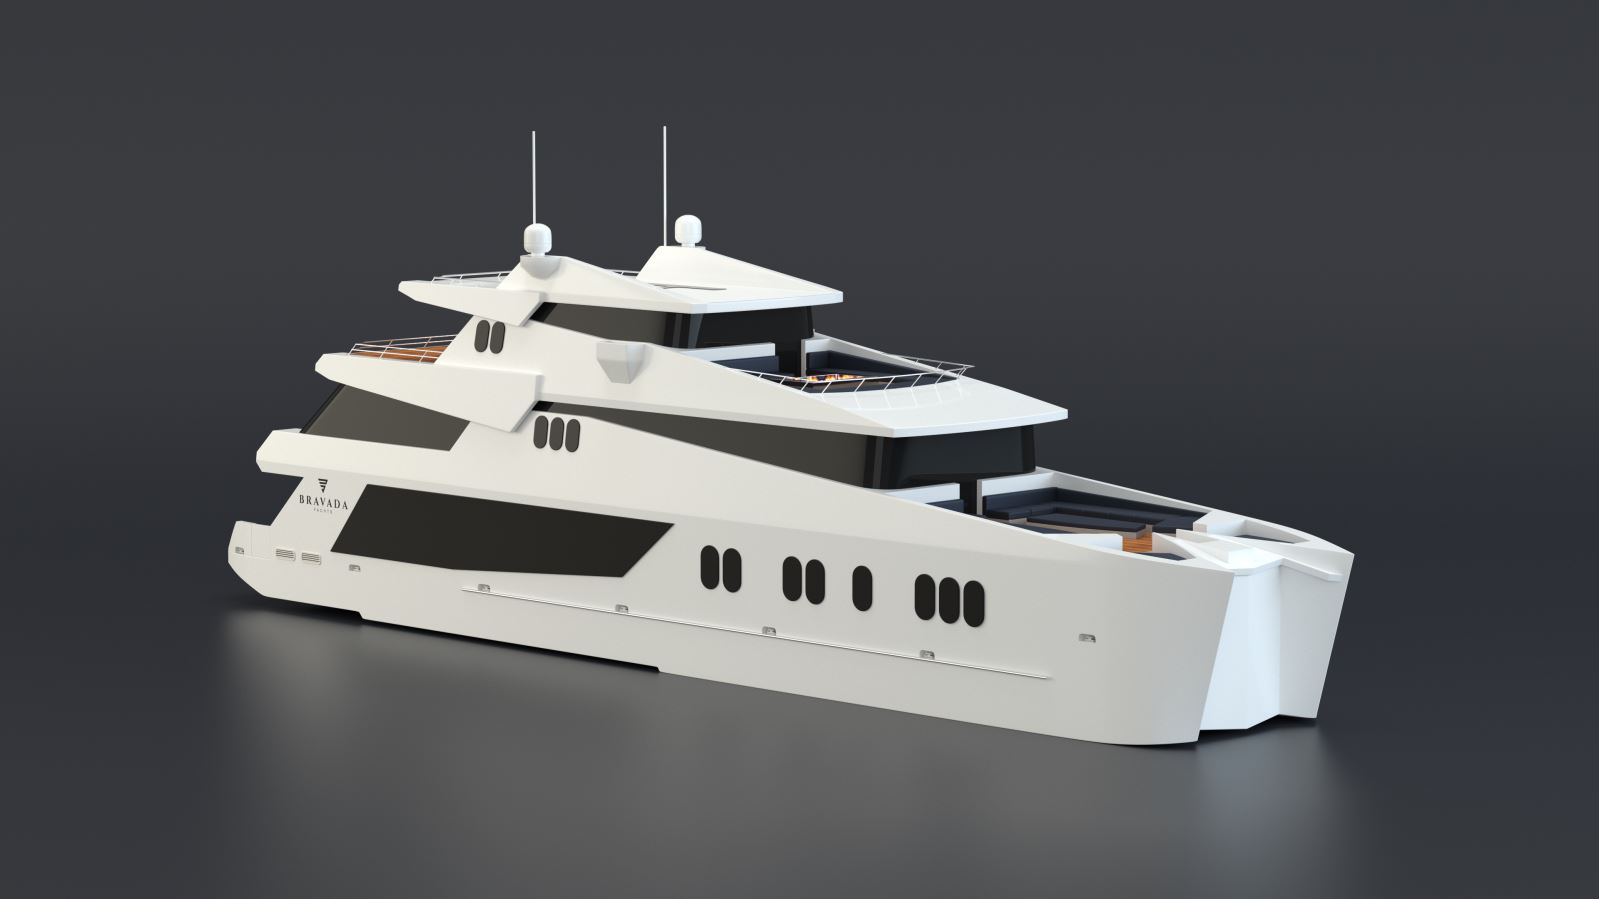 Bravada Yachts Unveils New Luxury Houseboat Houseboat Magazine